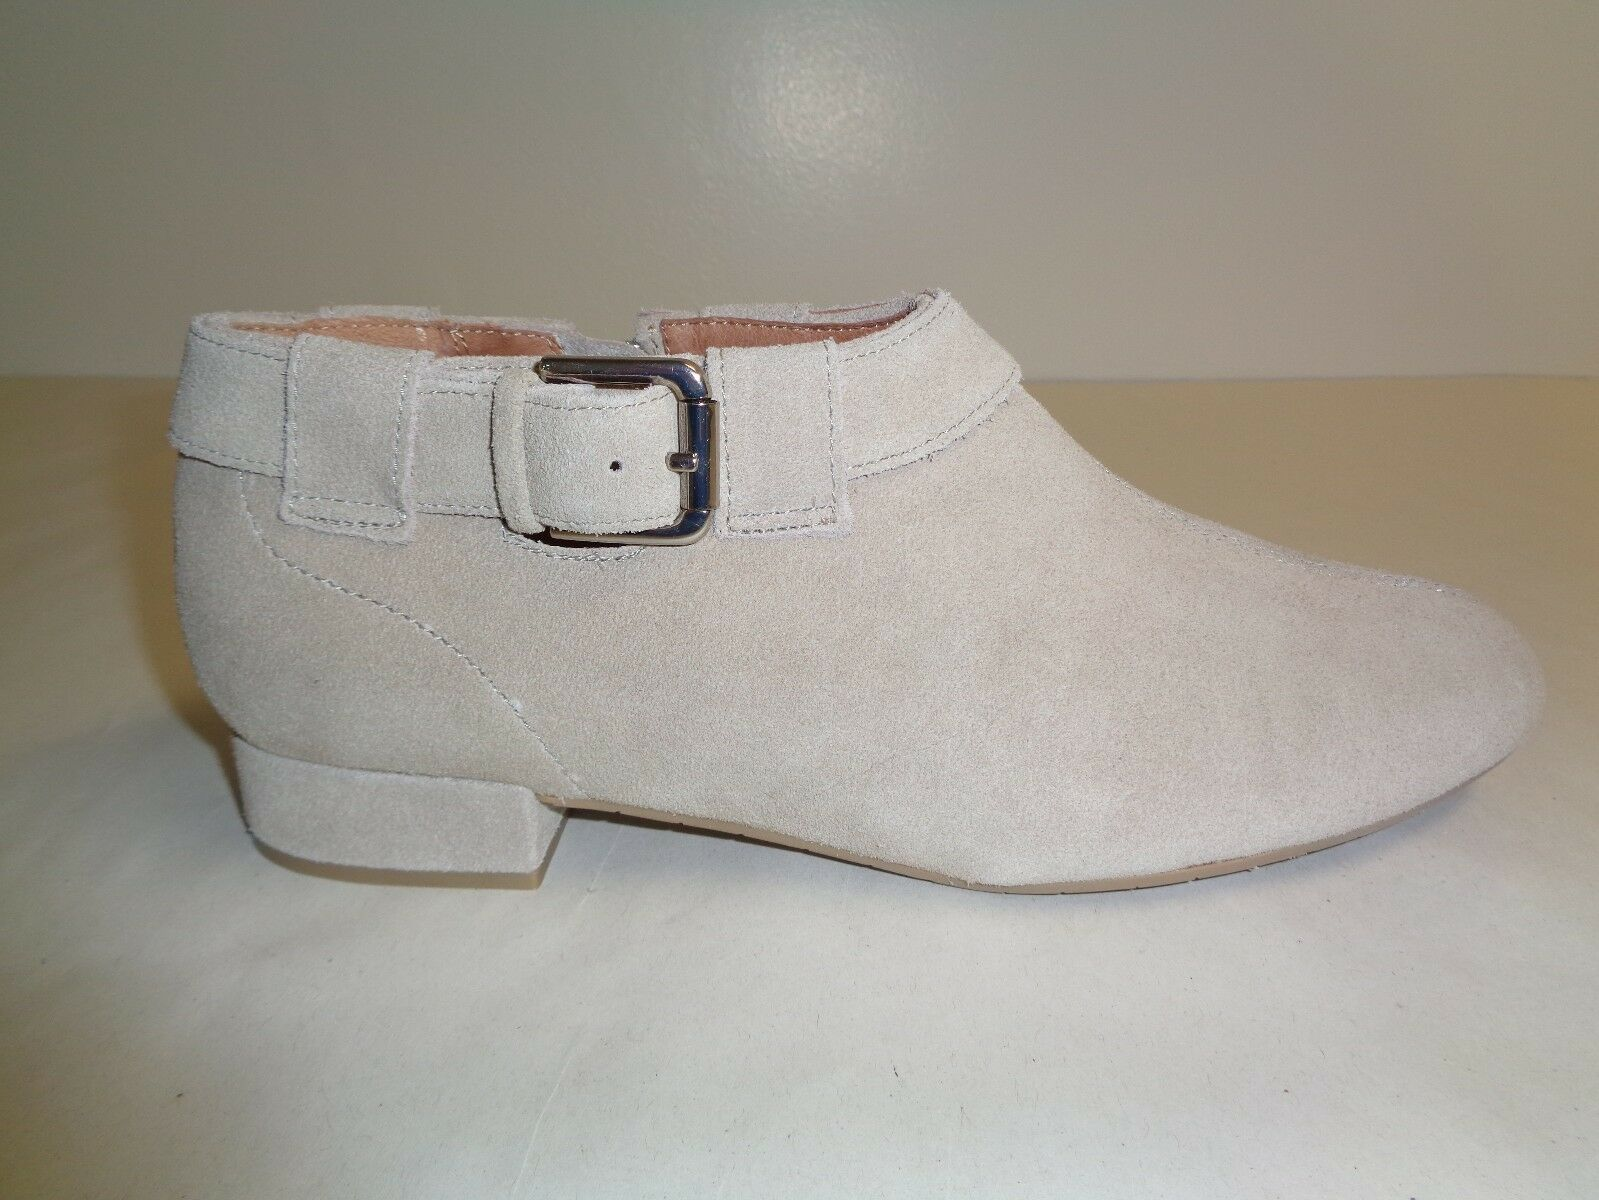 Nina Größe 7.5 DRENA PARCHMENT SPORT Tan Suede Ankle Stiefel NEU Damenschuhe Schuhes